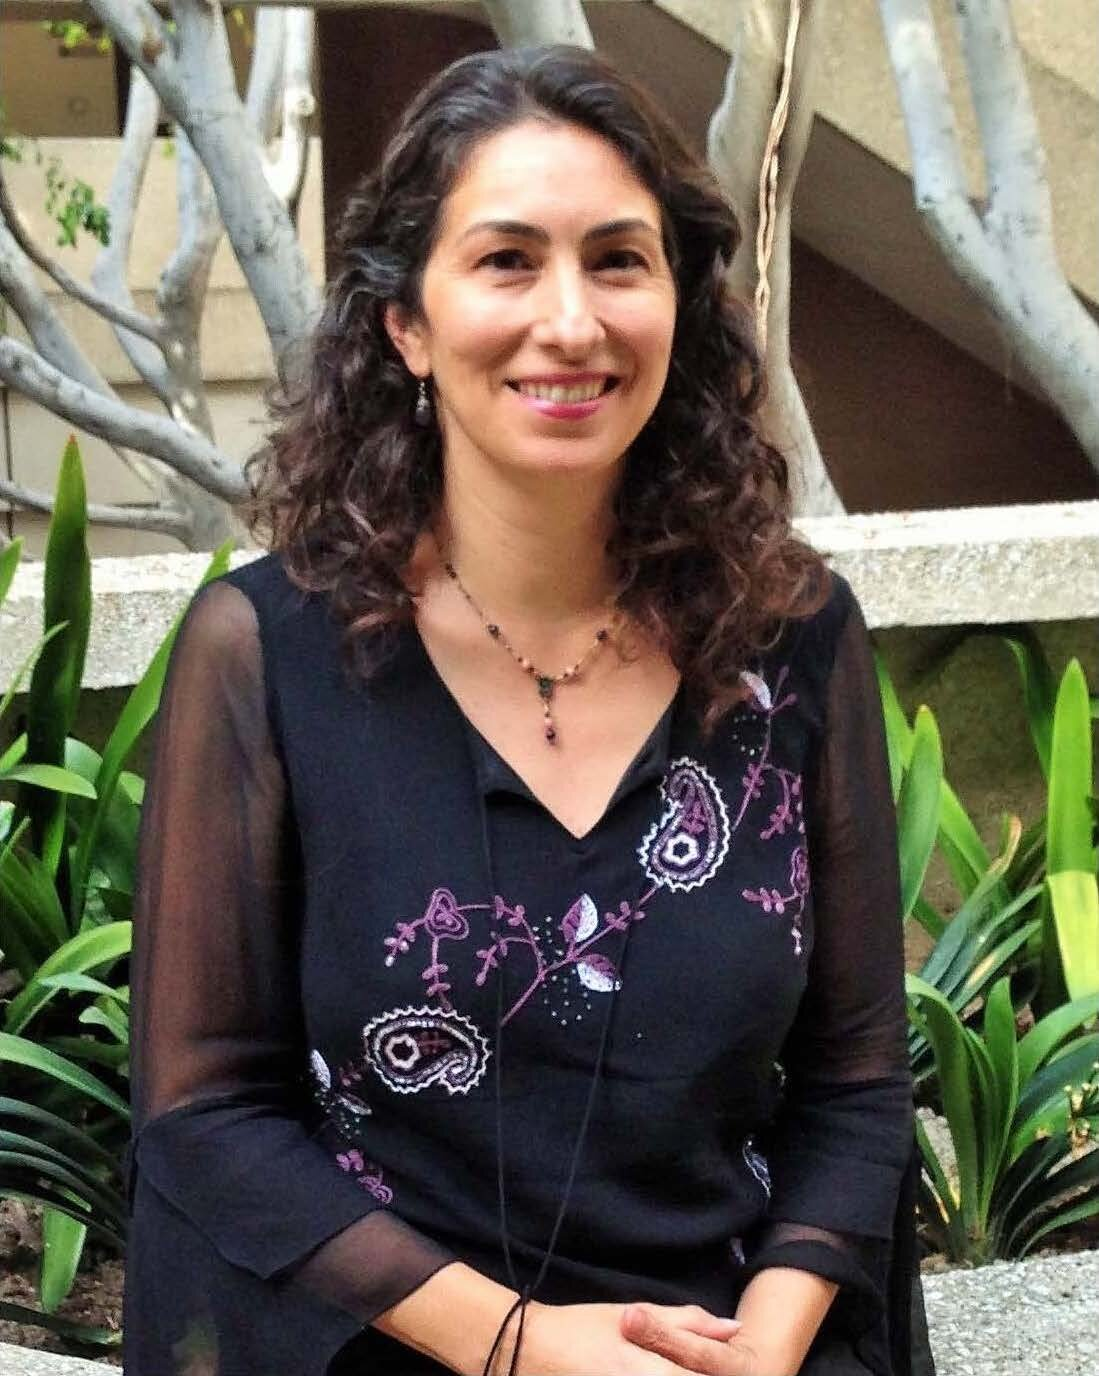 Dr. Rosa Moreno-Alcaraz is a licensed psychologist at CAPS on campus.